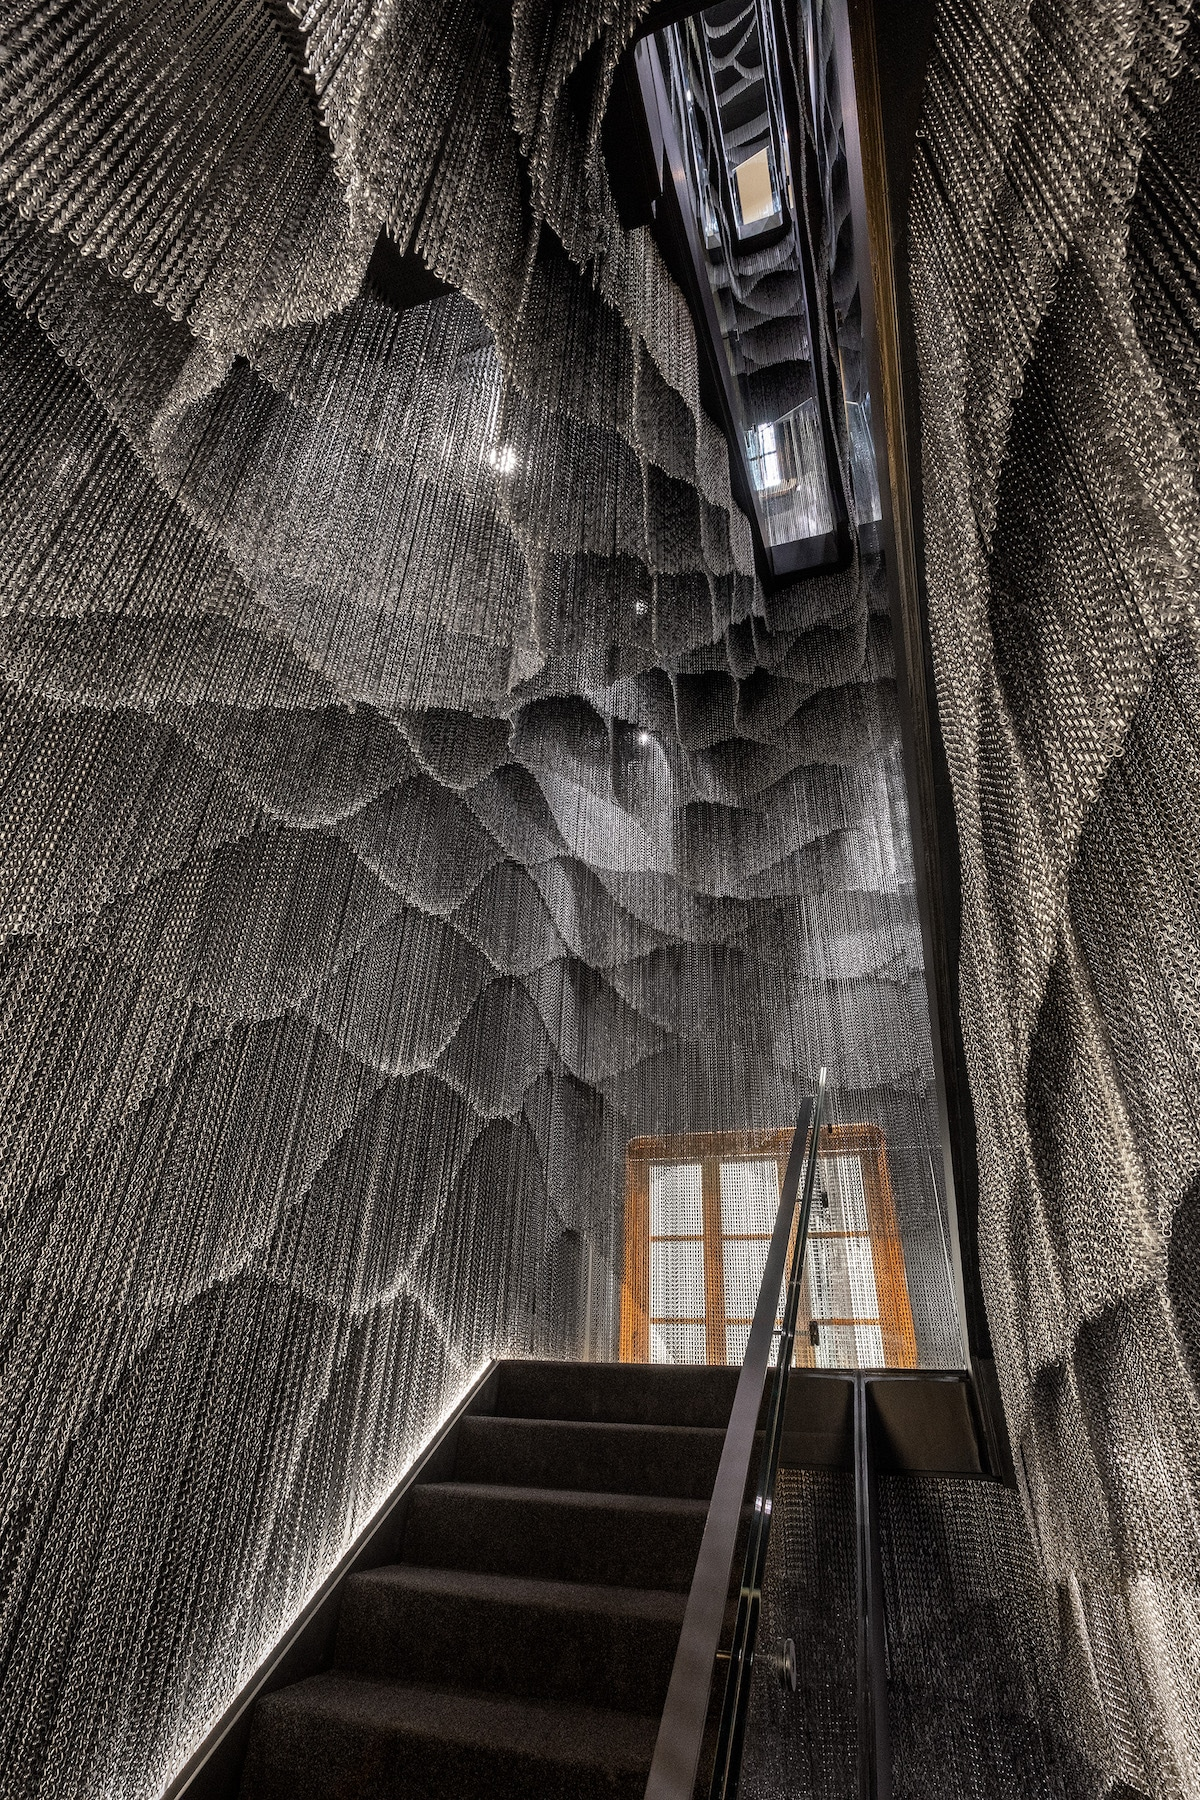 Inside Kengo Kuma Aluminum Chain Staircase in Gaudí's Casa Batlló, Captured by Jordi Anguera